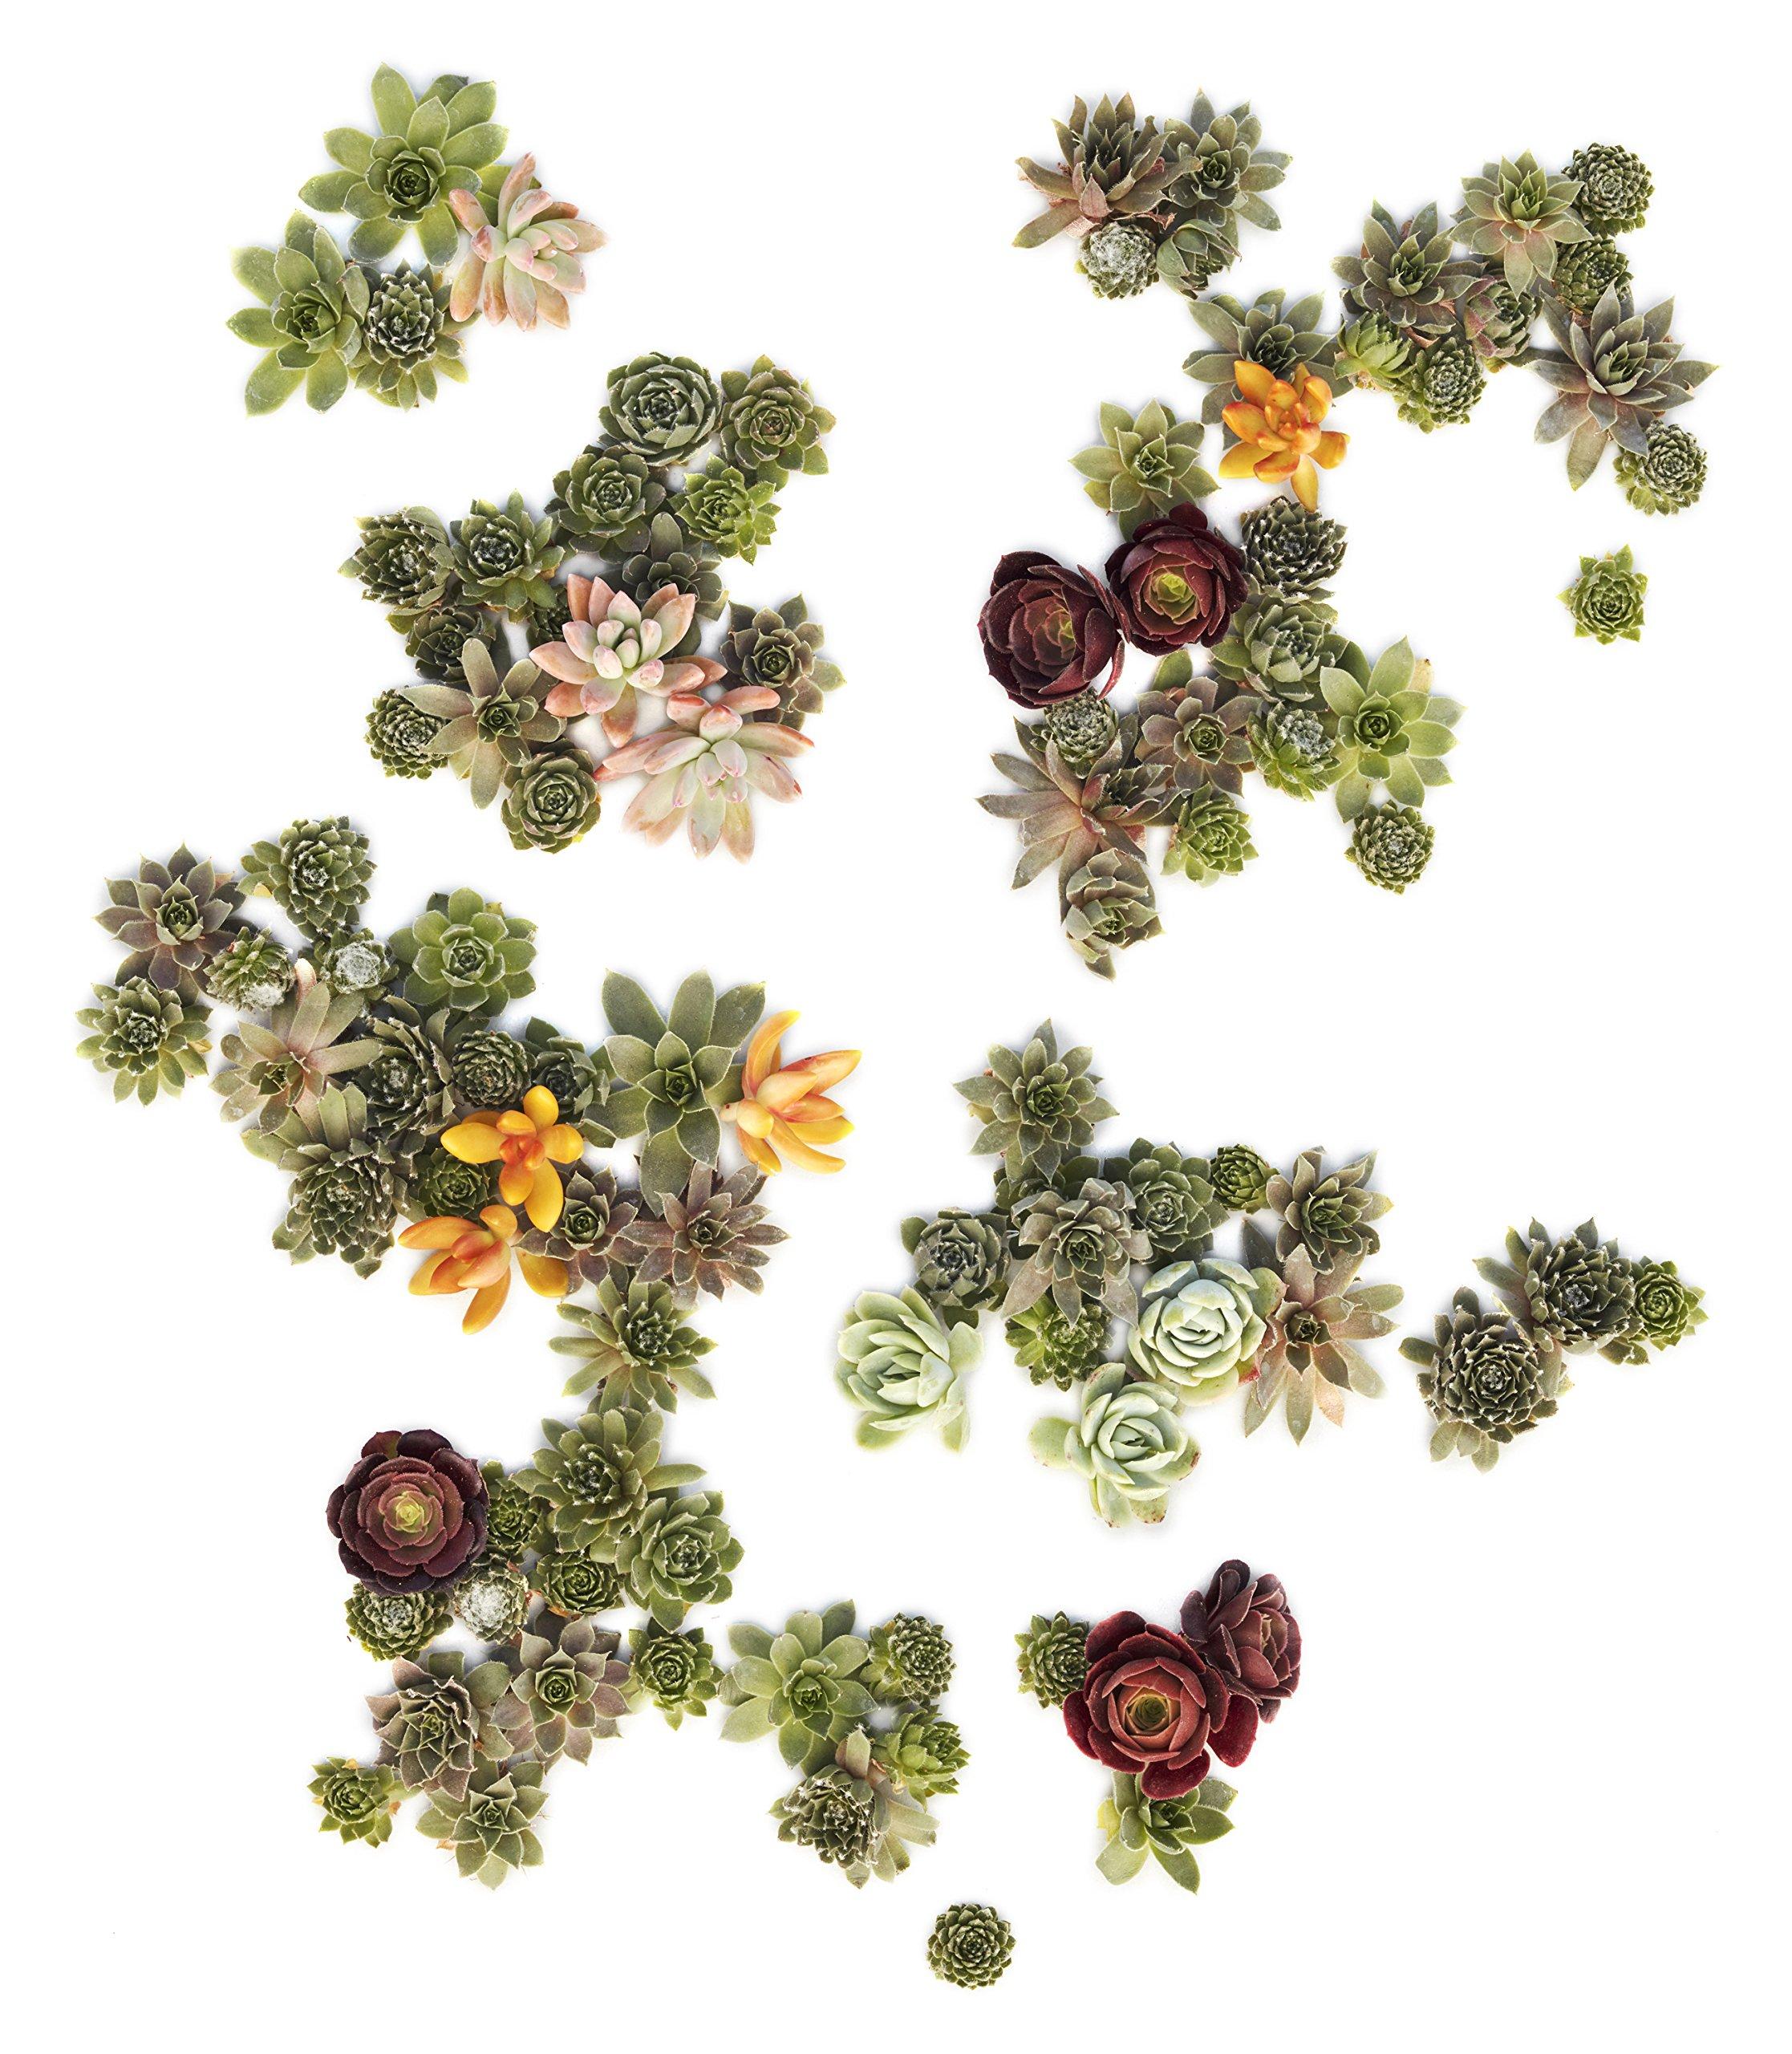 Succulent Gardens Assorted-cutting-living-pictures-125 Living Picture Cuttings Succulent, 125 1 quart, Multicolor